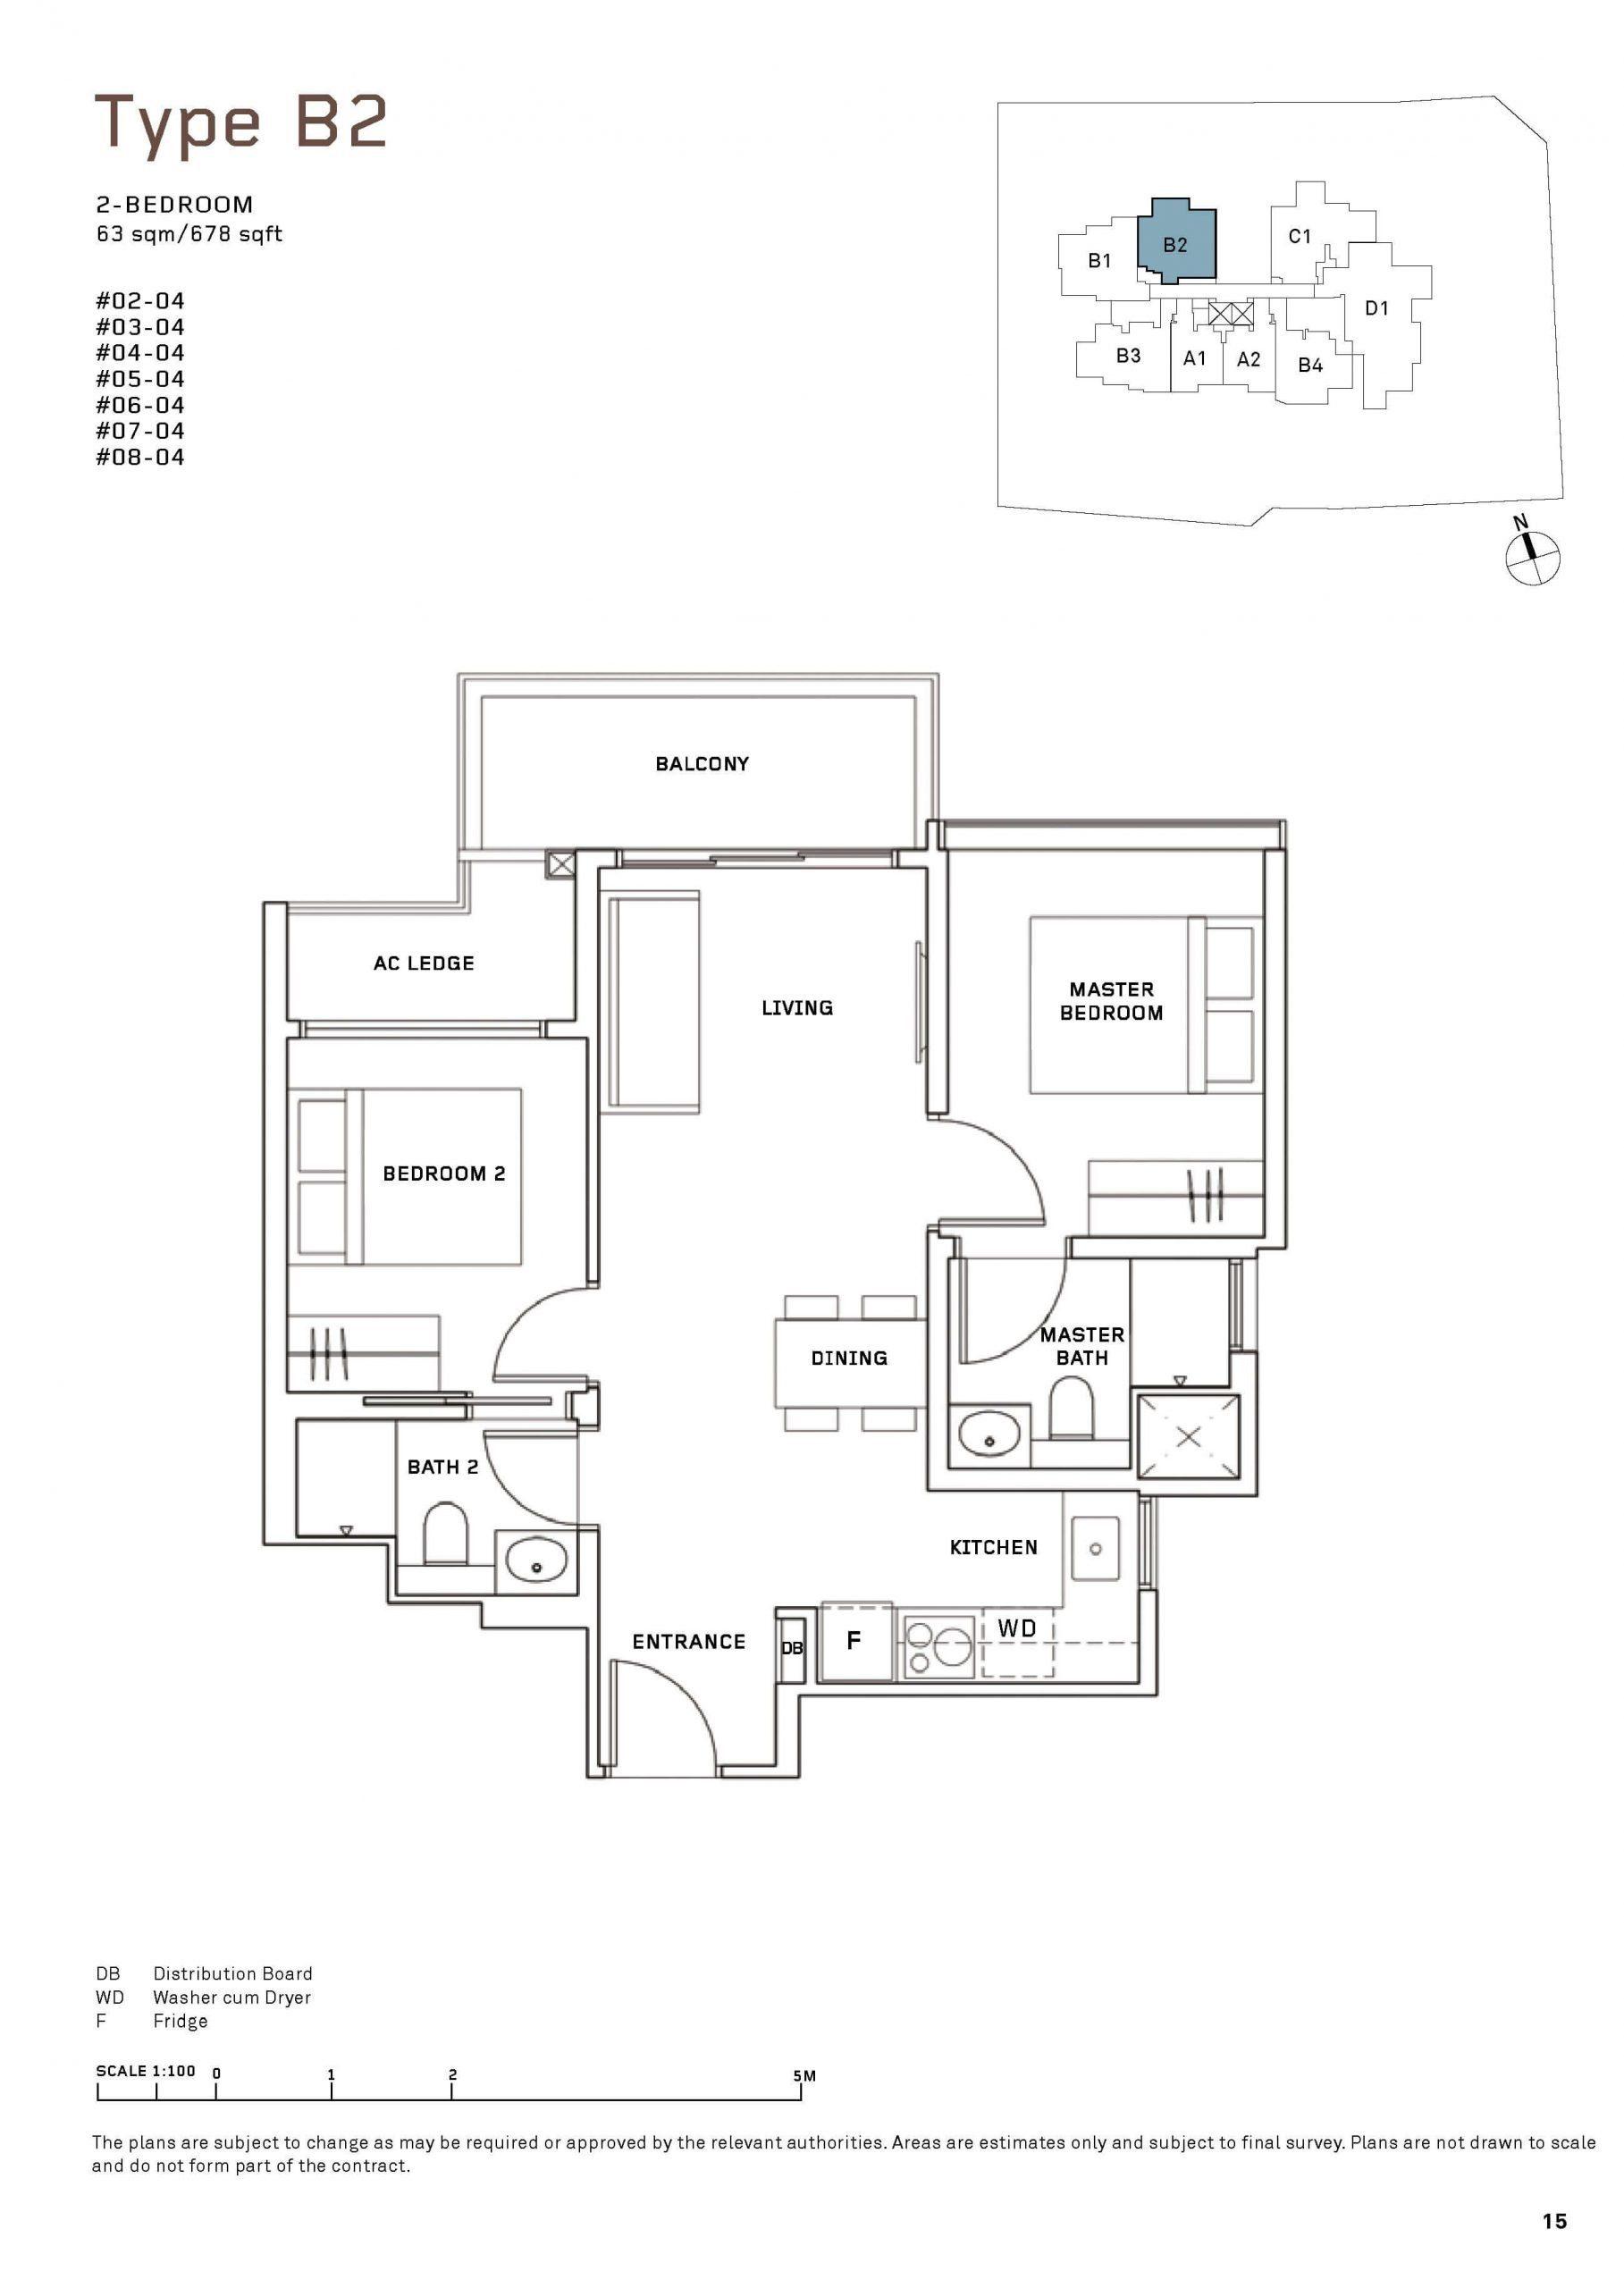 MYRA Condo Floor Plan 2 Bedroom 2 scaled